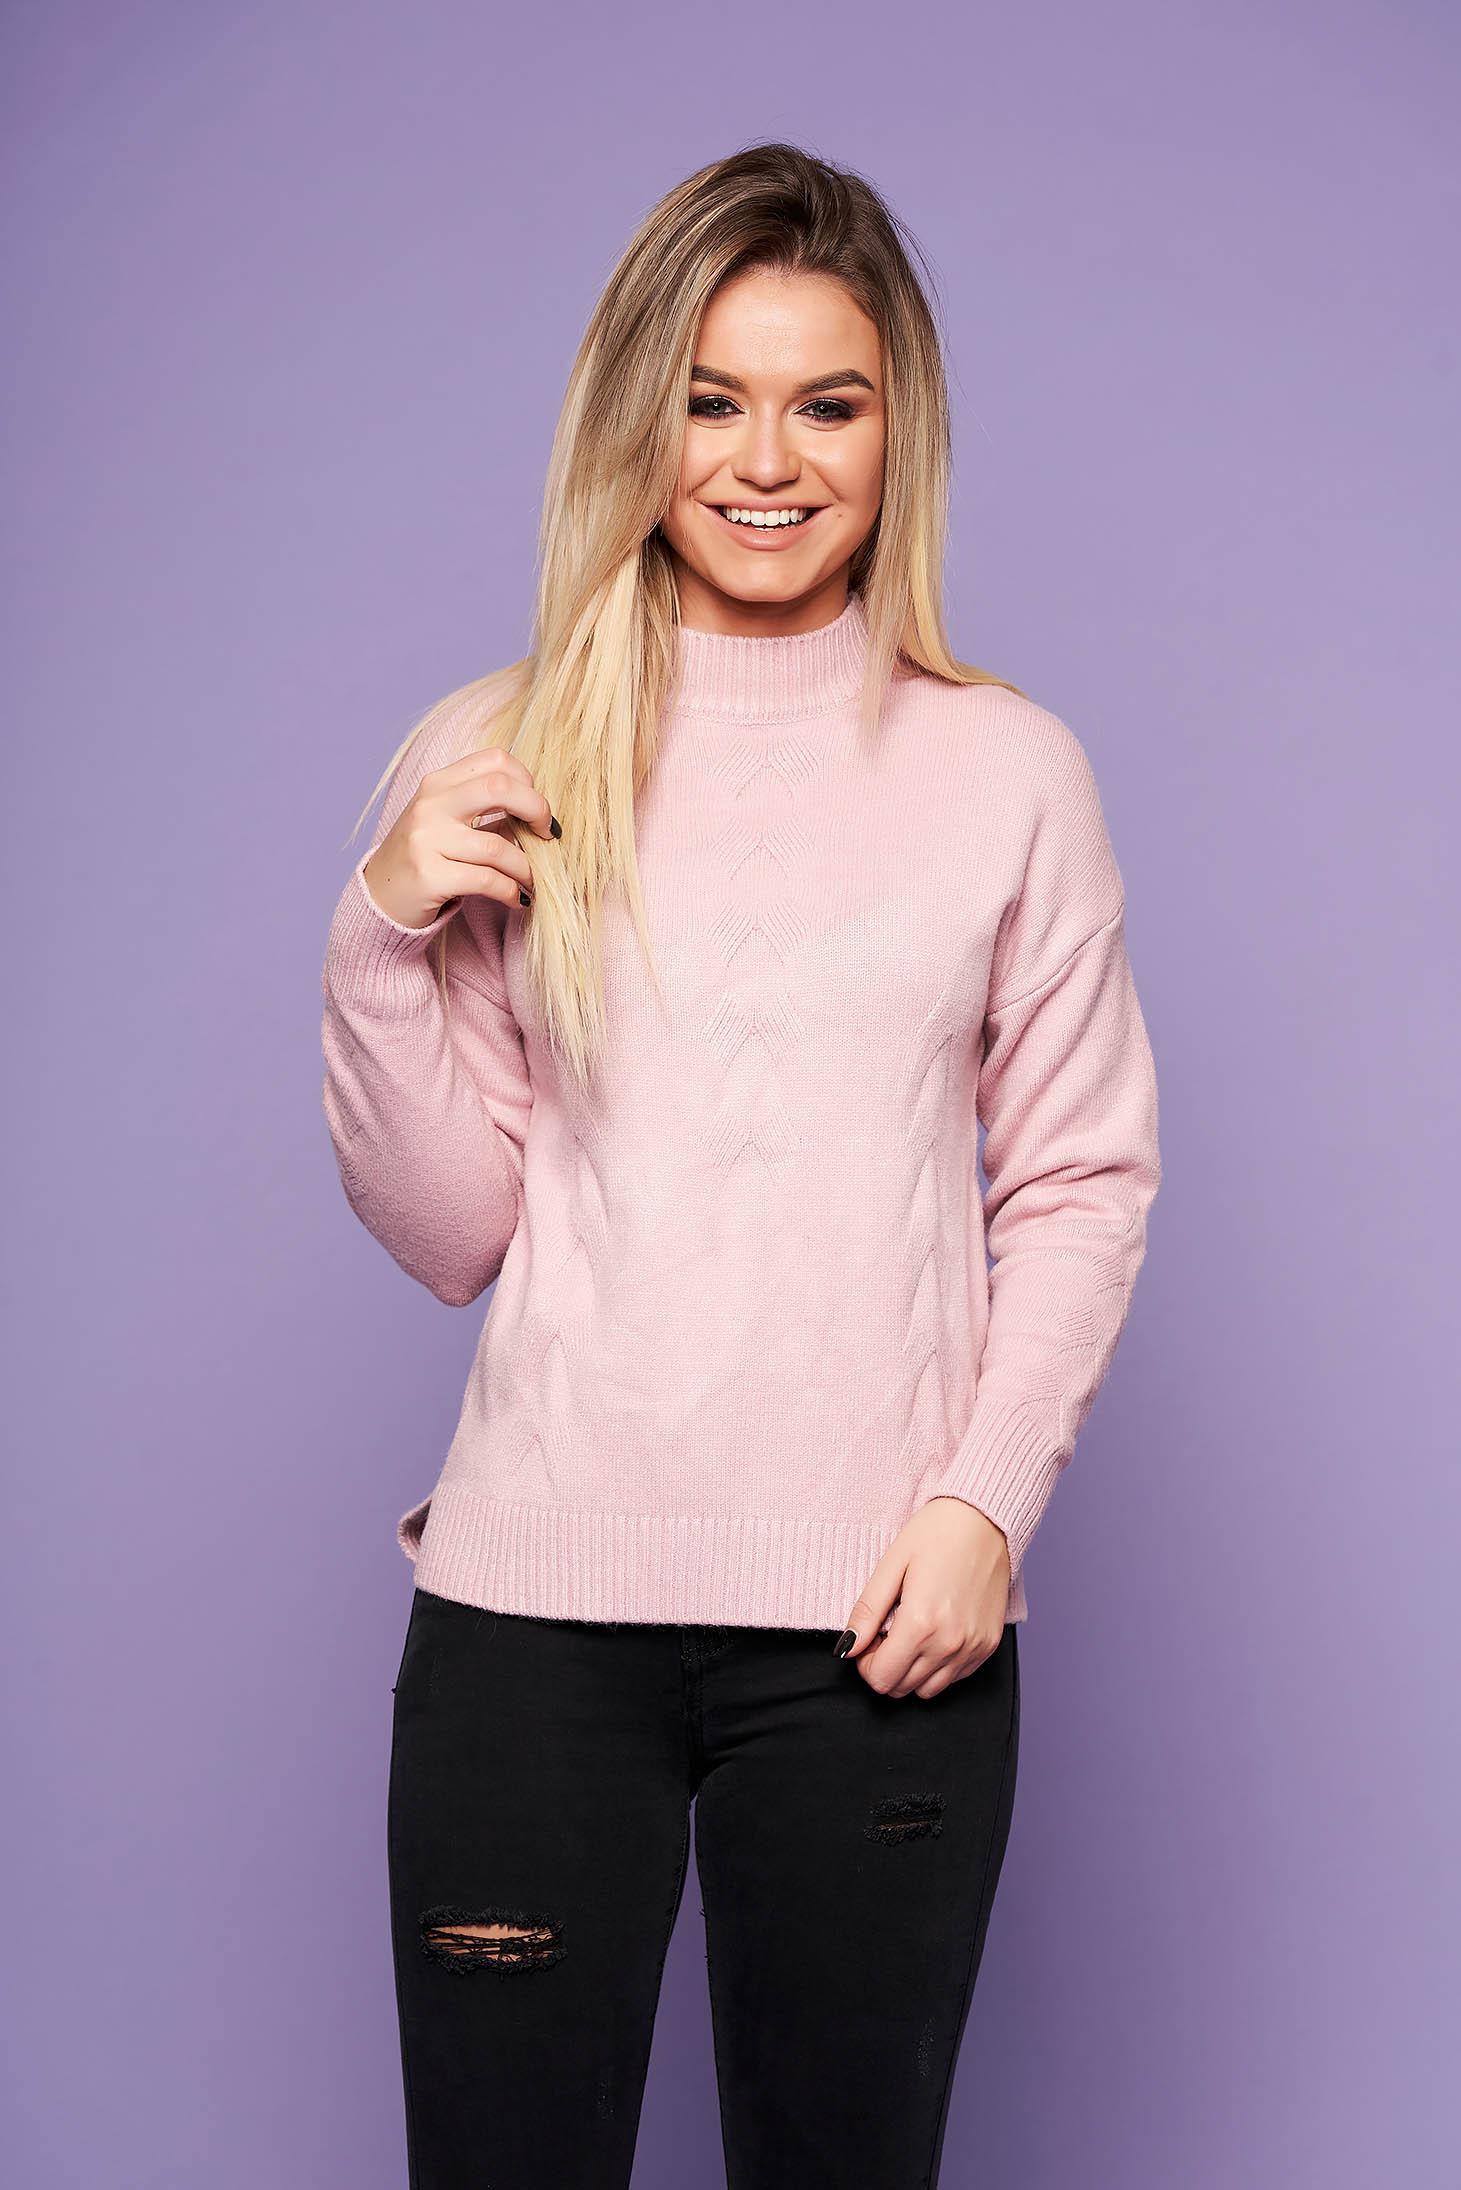 Pulover SunShine roz prafuit casual cu croi larg din material tricotat cu maneca lunga